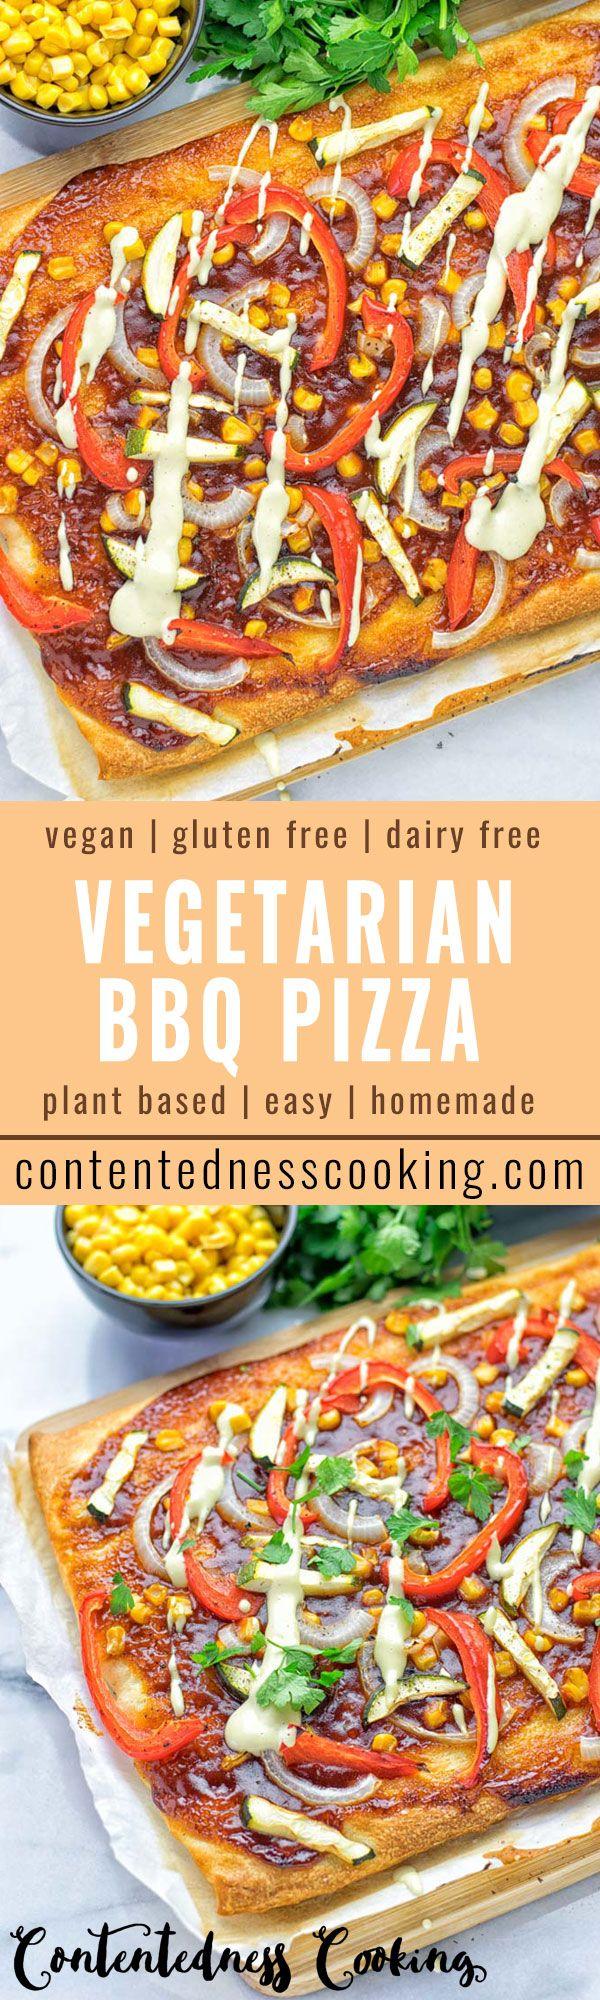 Vegetarian BBQ Pizza | #vegan #glutenfree #contentednesscooking